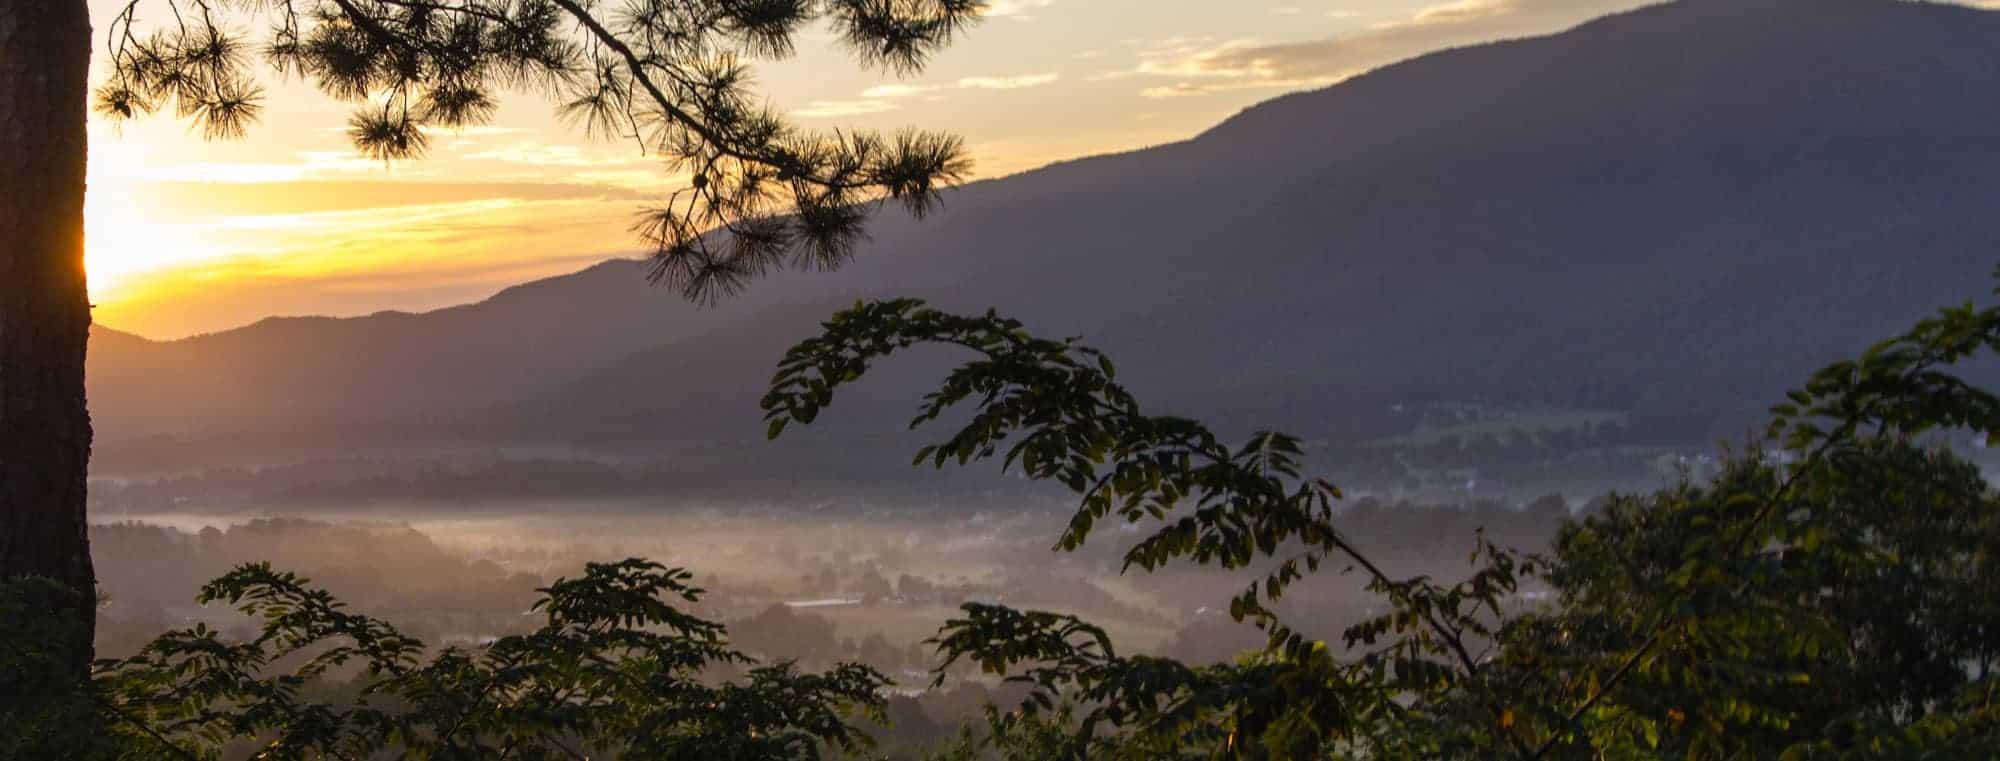 smoky mountains sunrise foggy